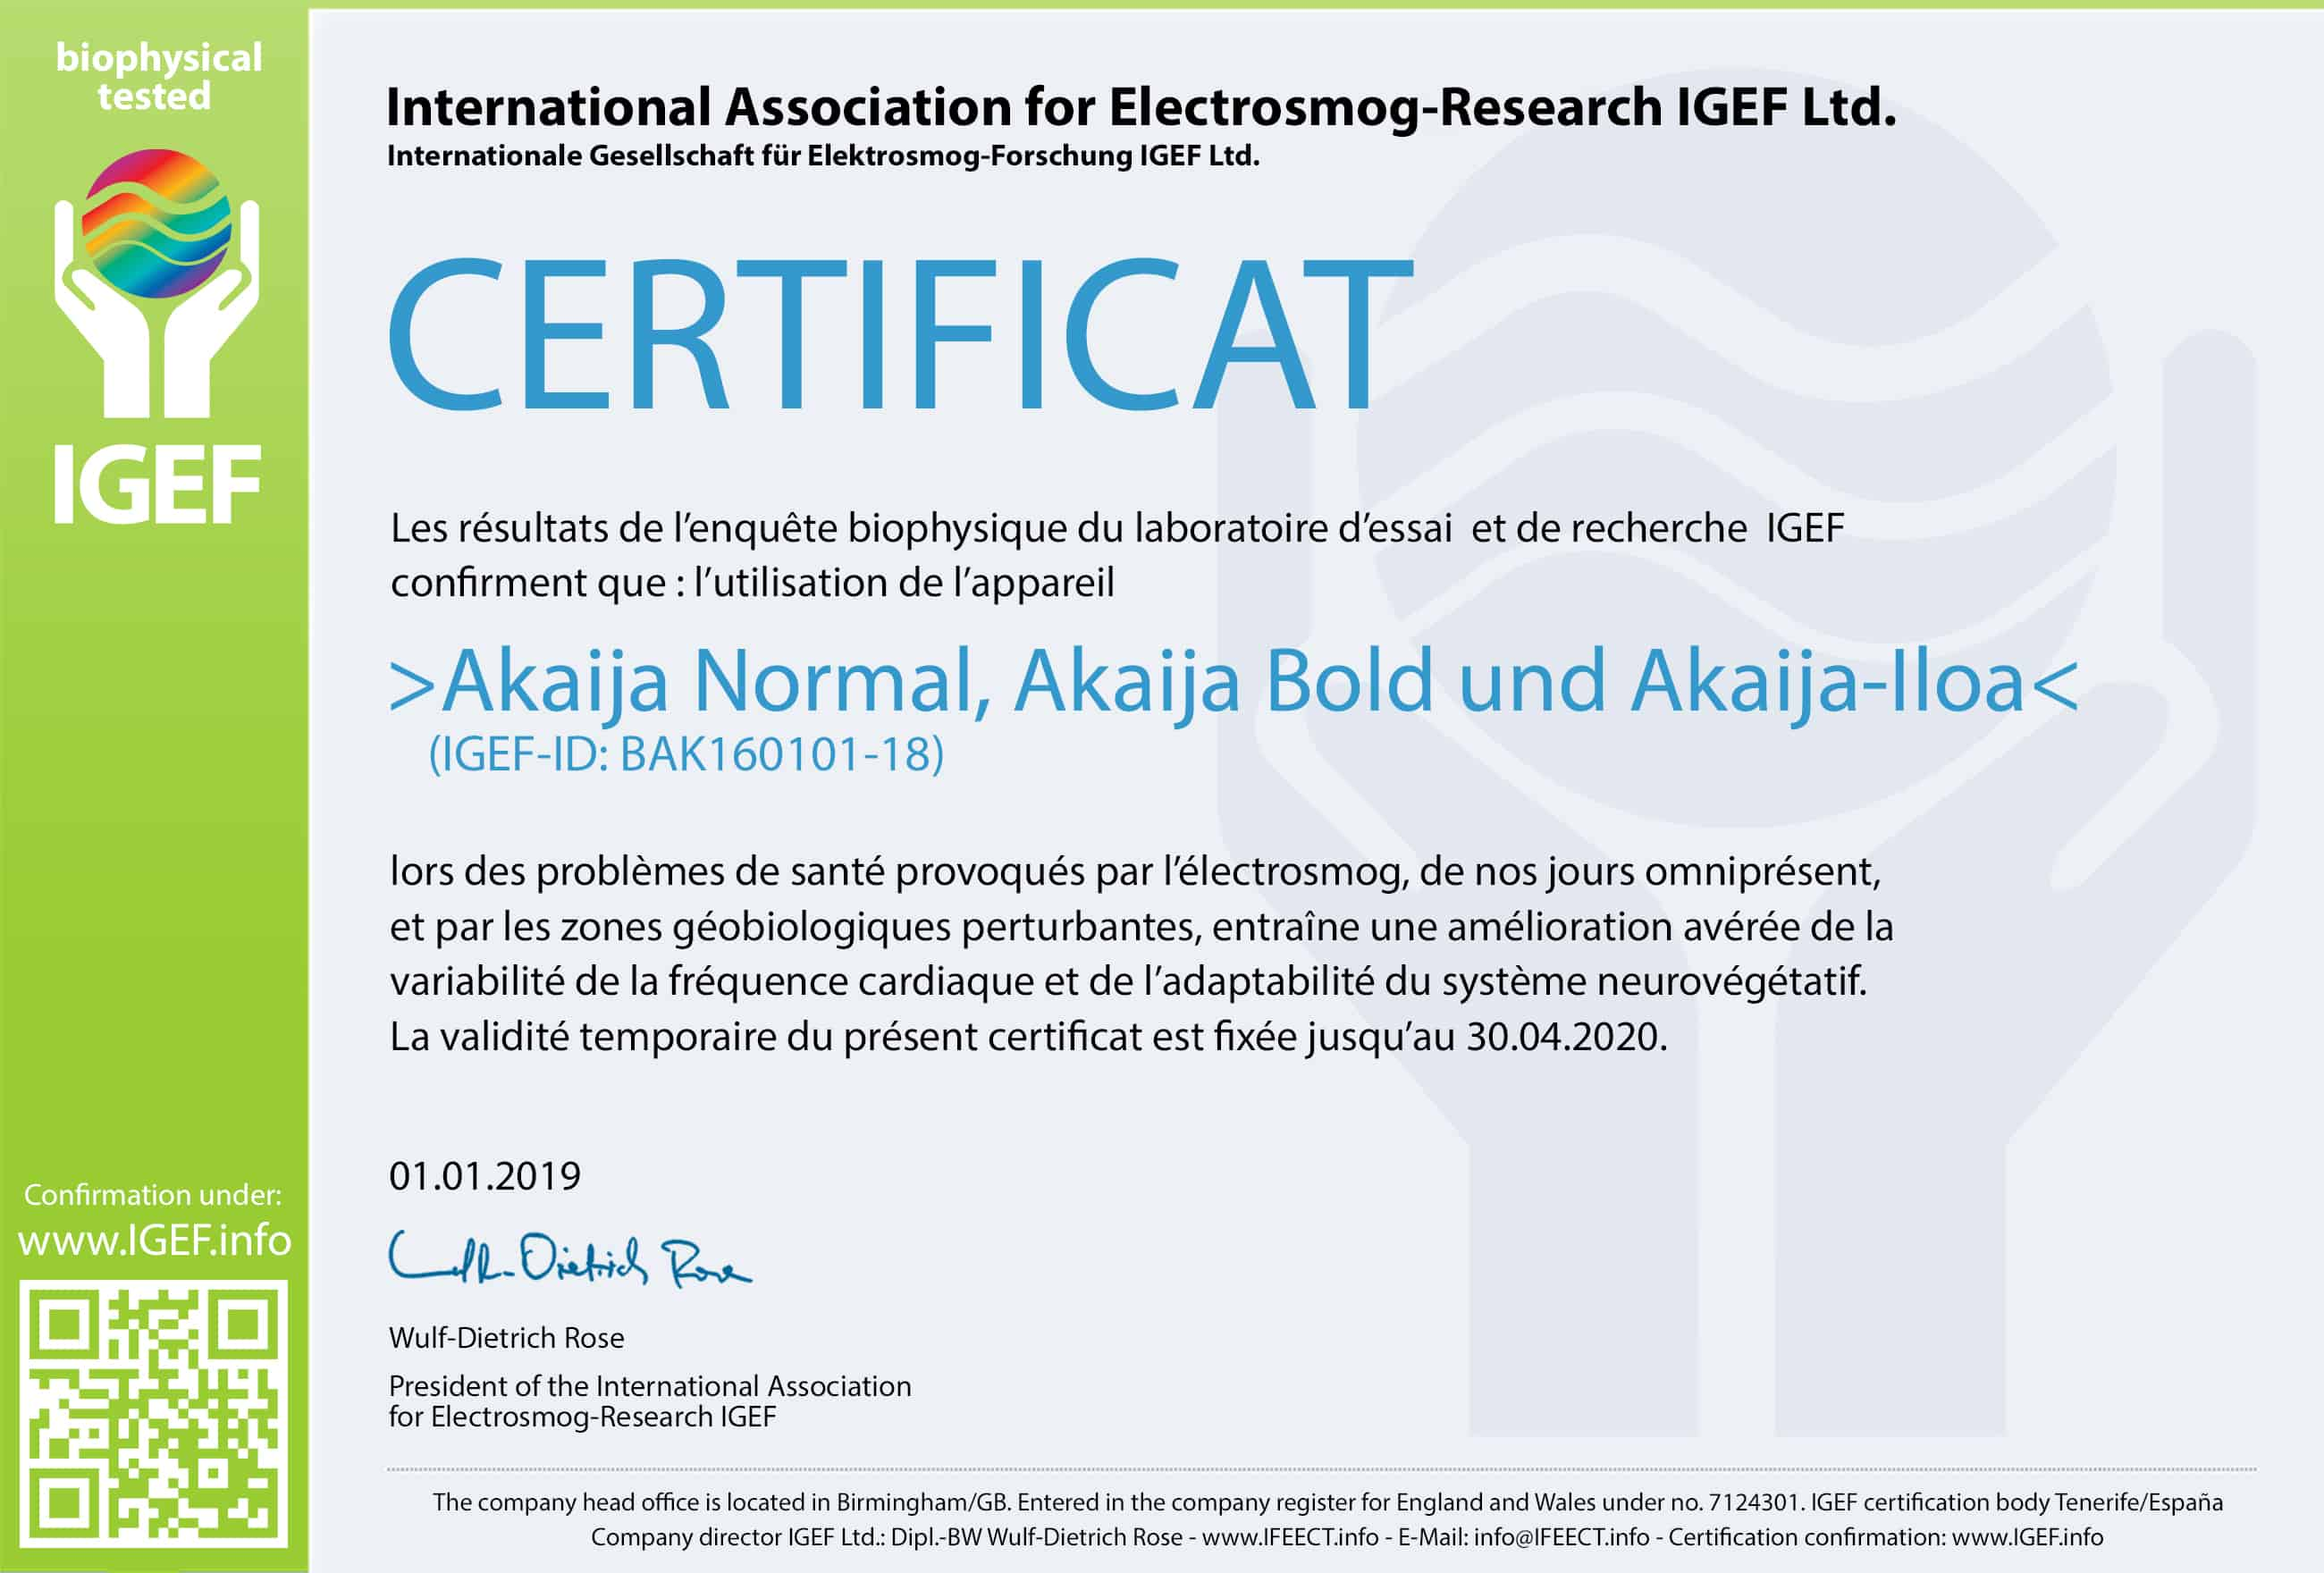 IGEF-Zertifikat-BAK-FR-19